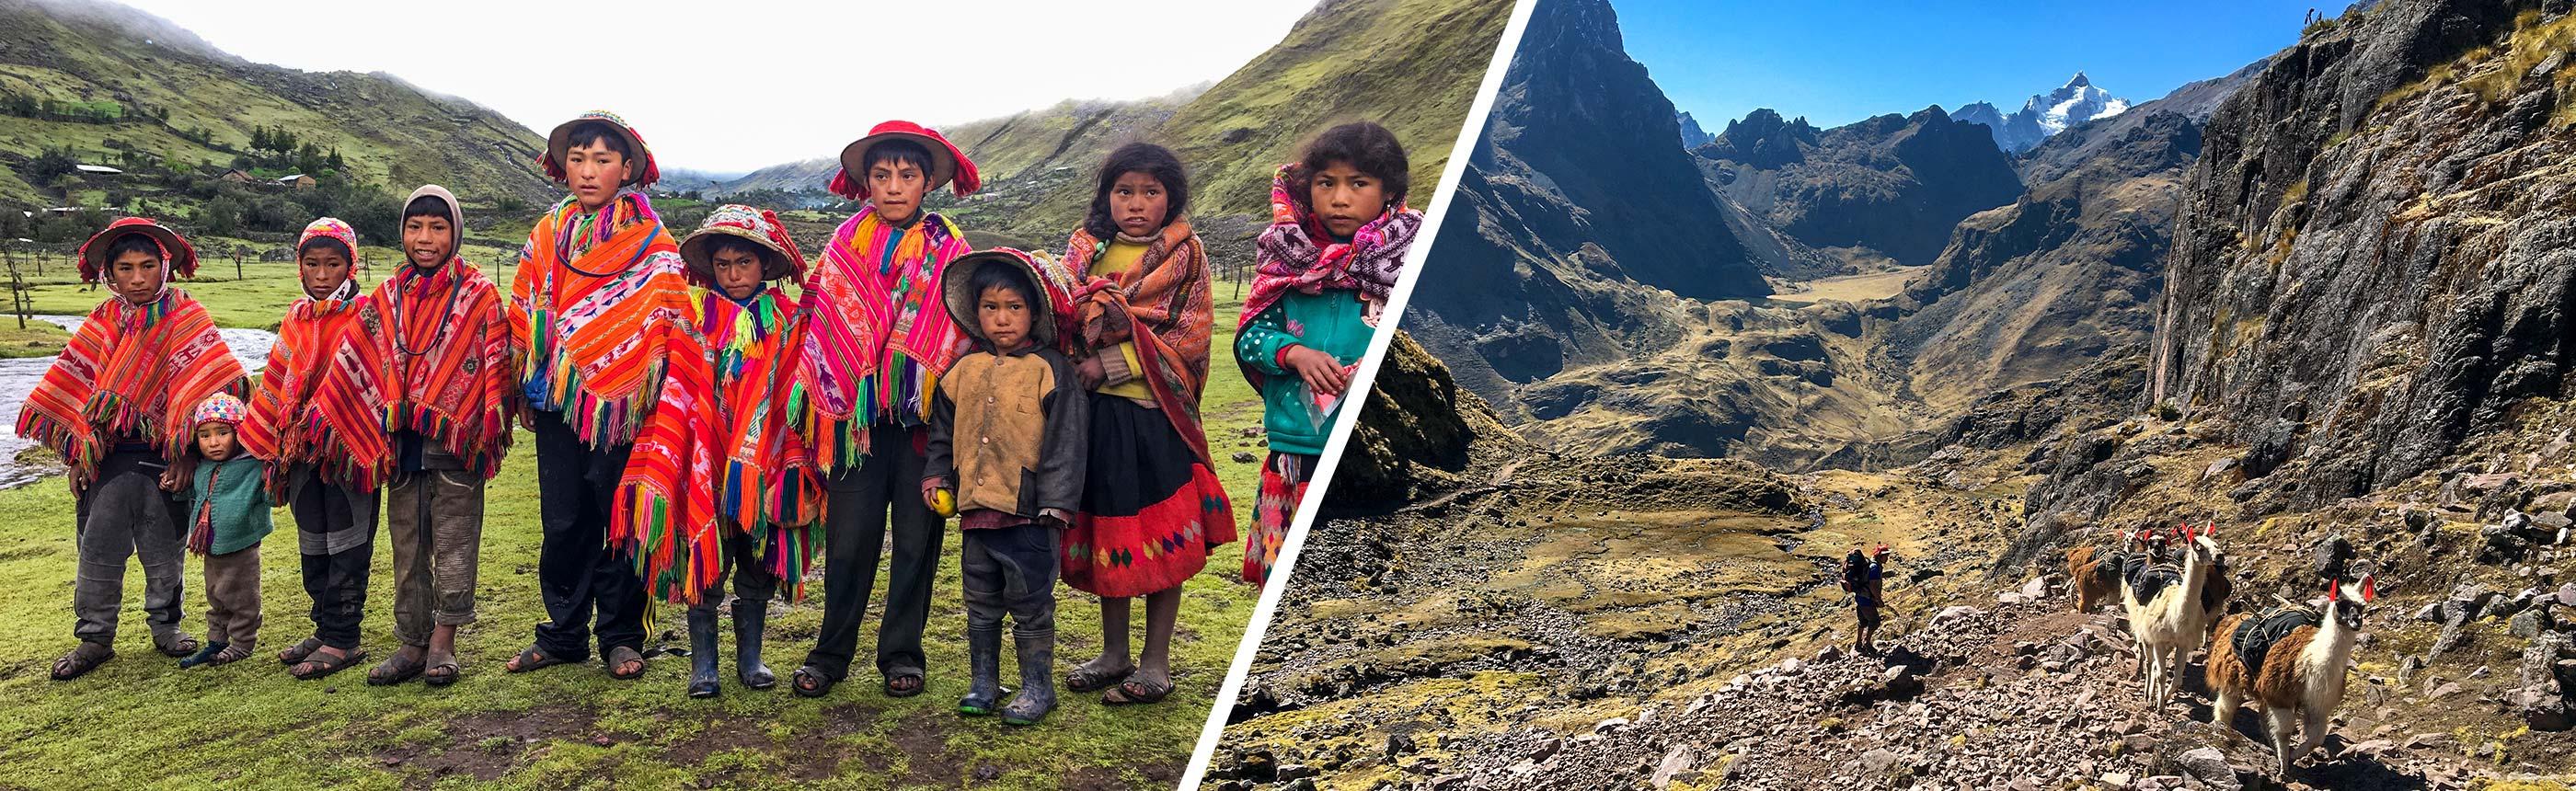 Lares Trek & Short Inca Trail 5 Days